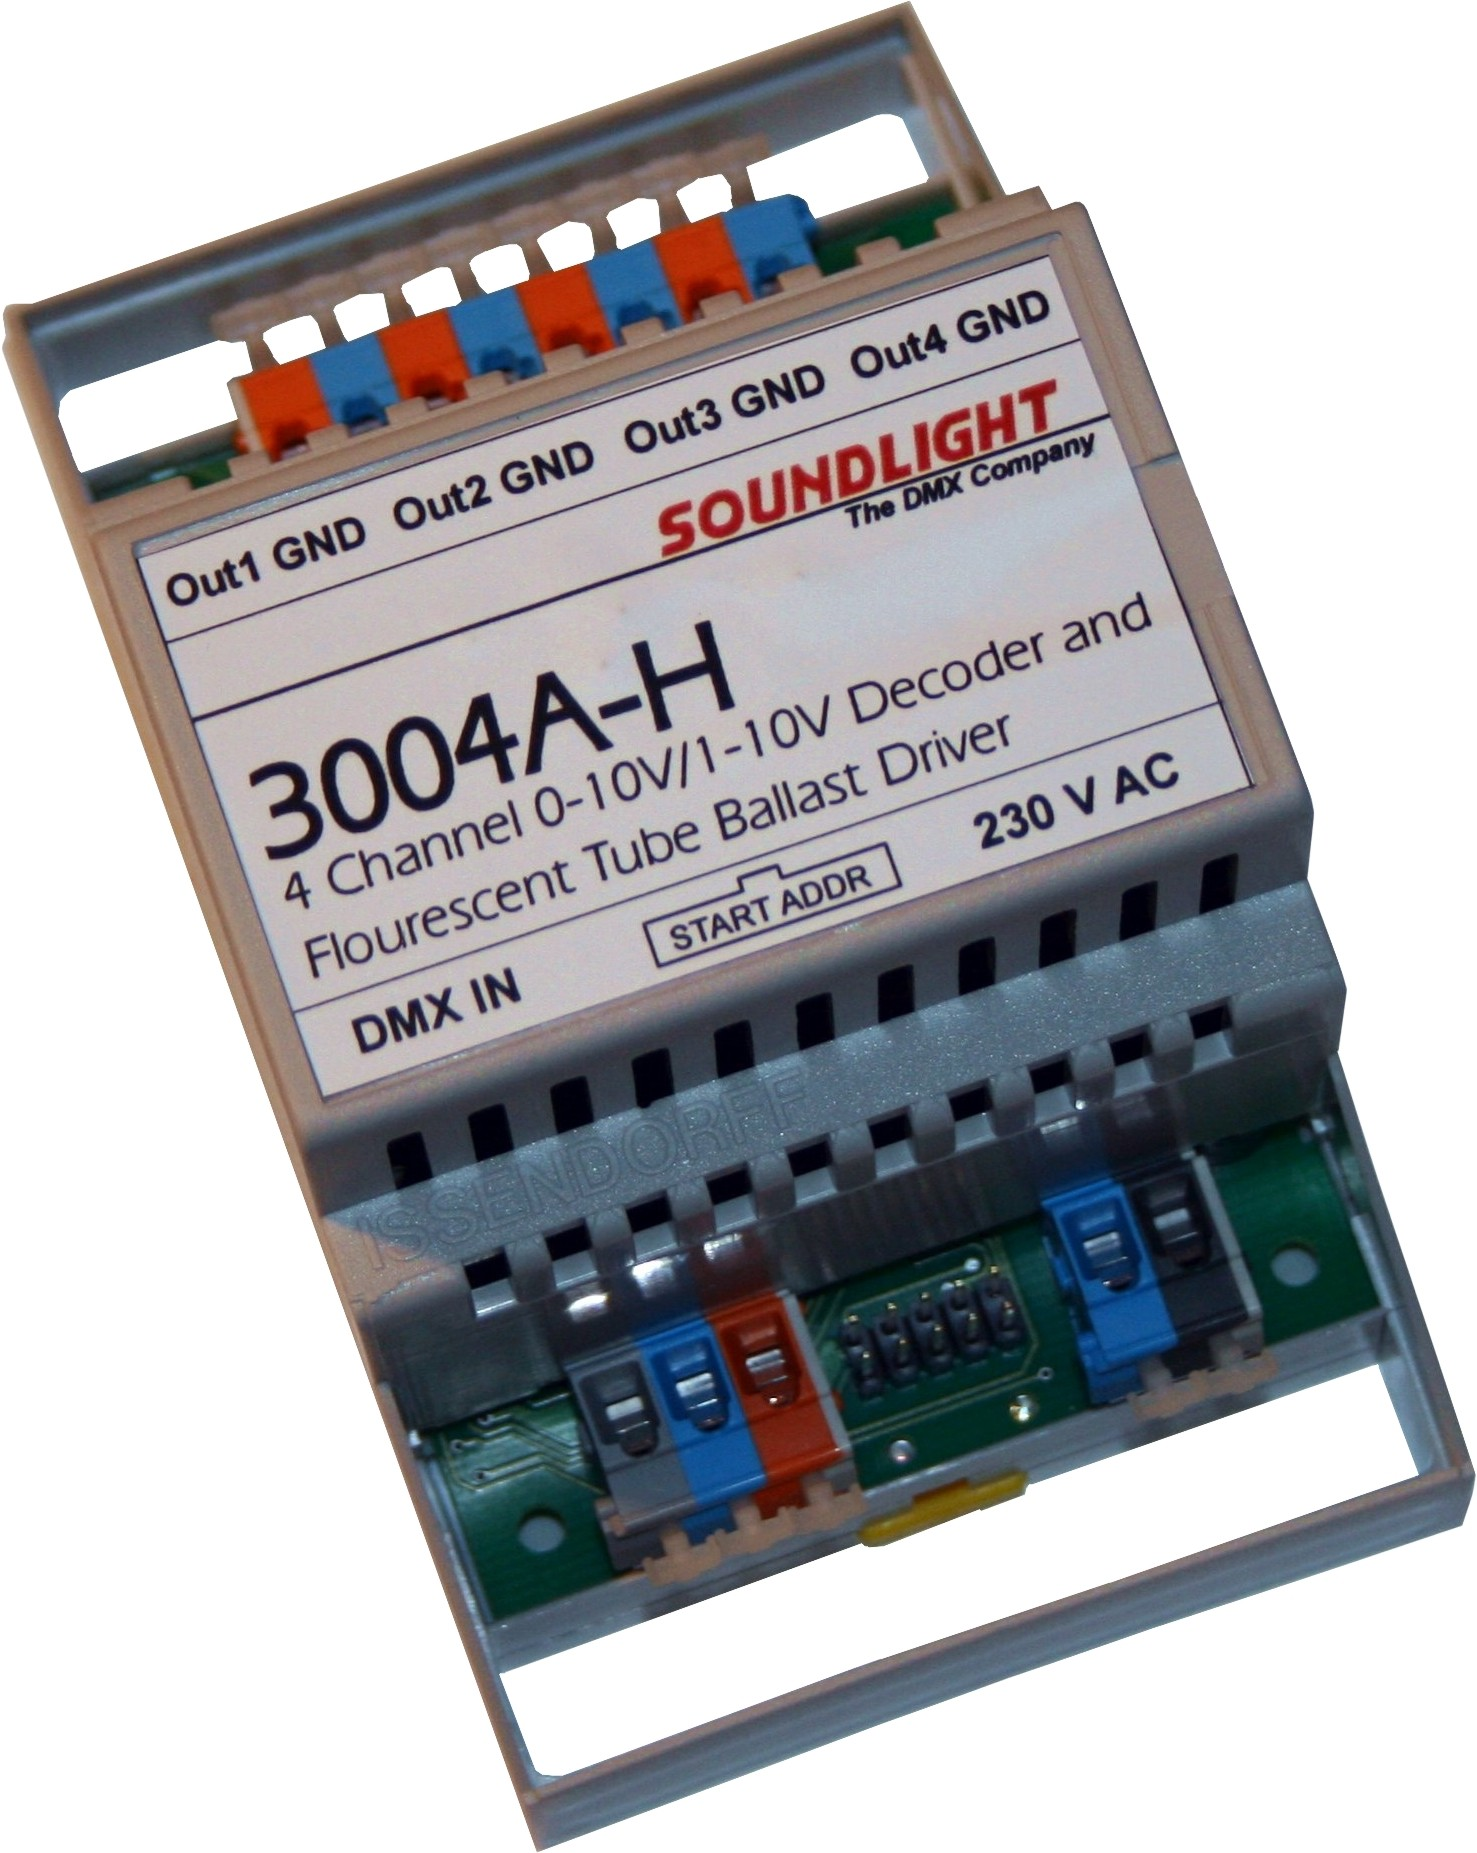 3004A-H | DMX Demux 4ch Universeel